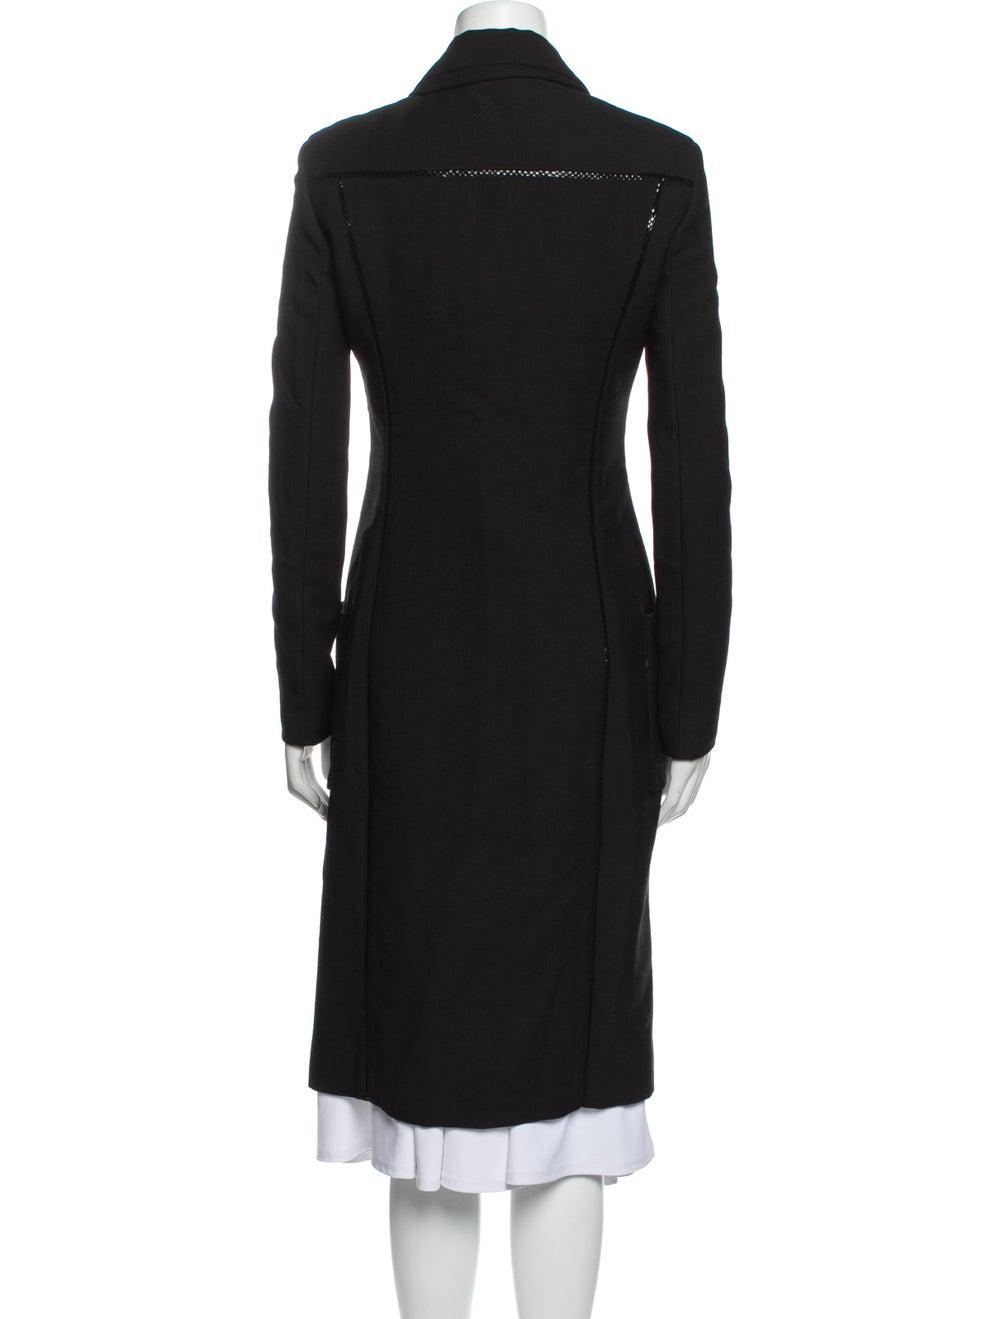 Gianni Versace Vintage Coat Black - image 3